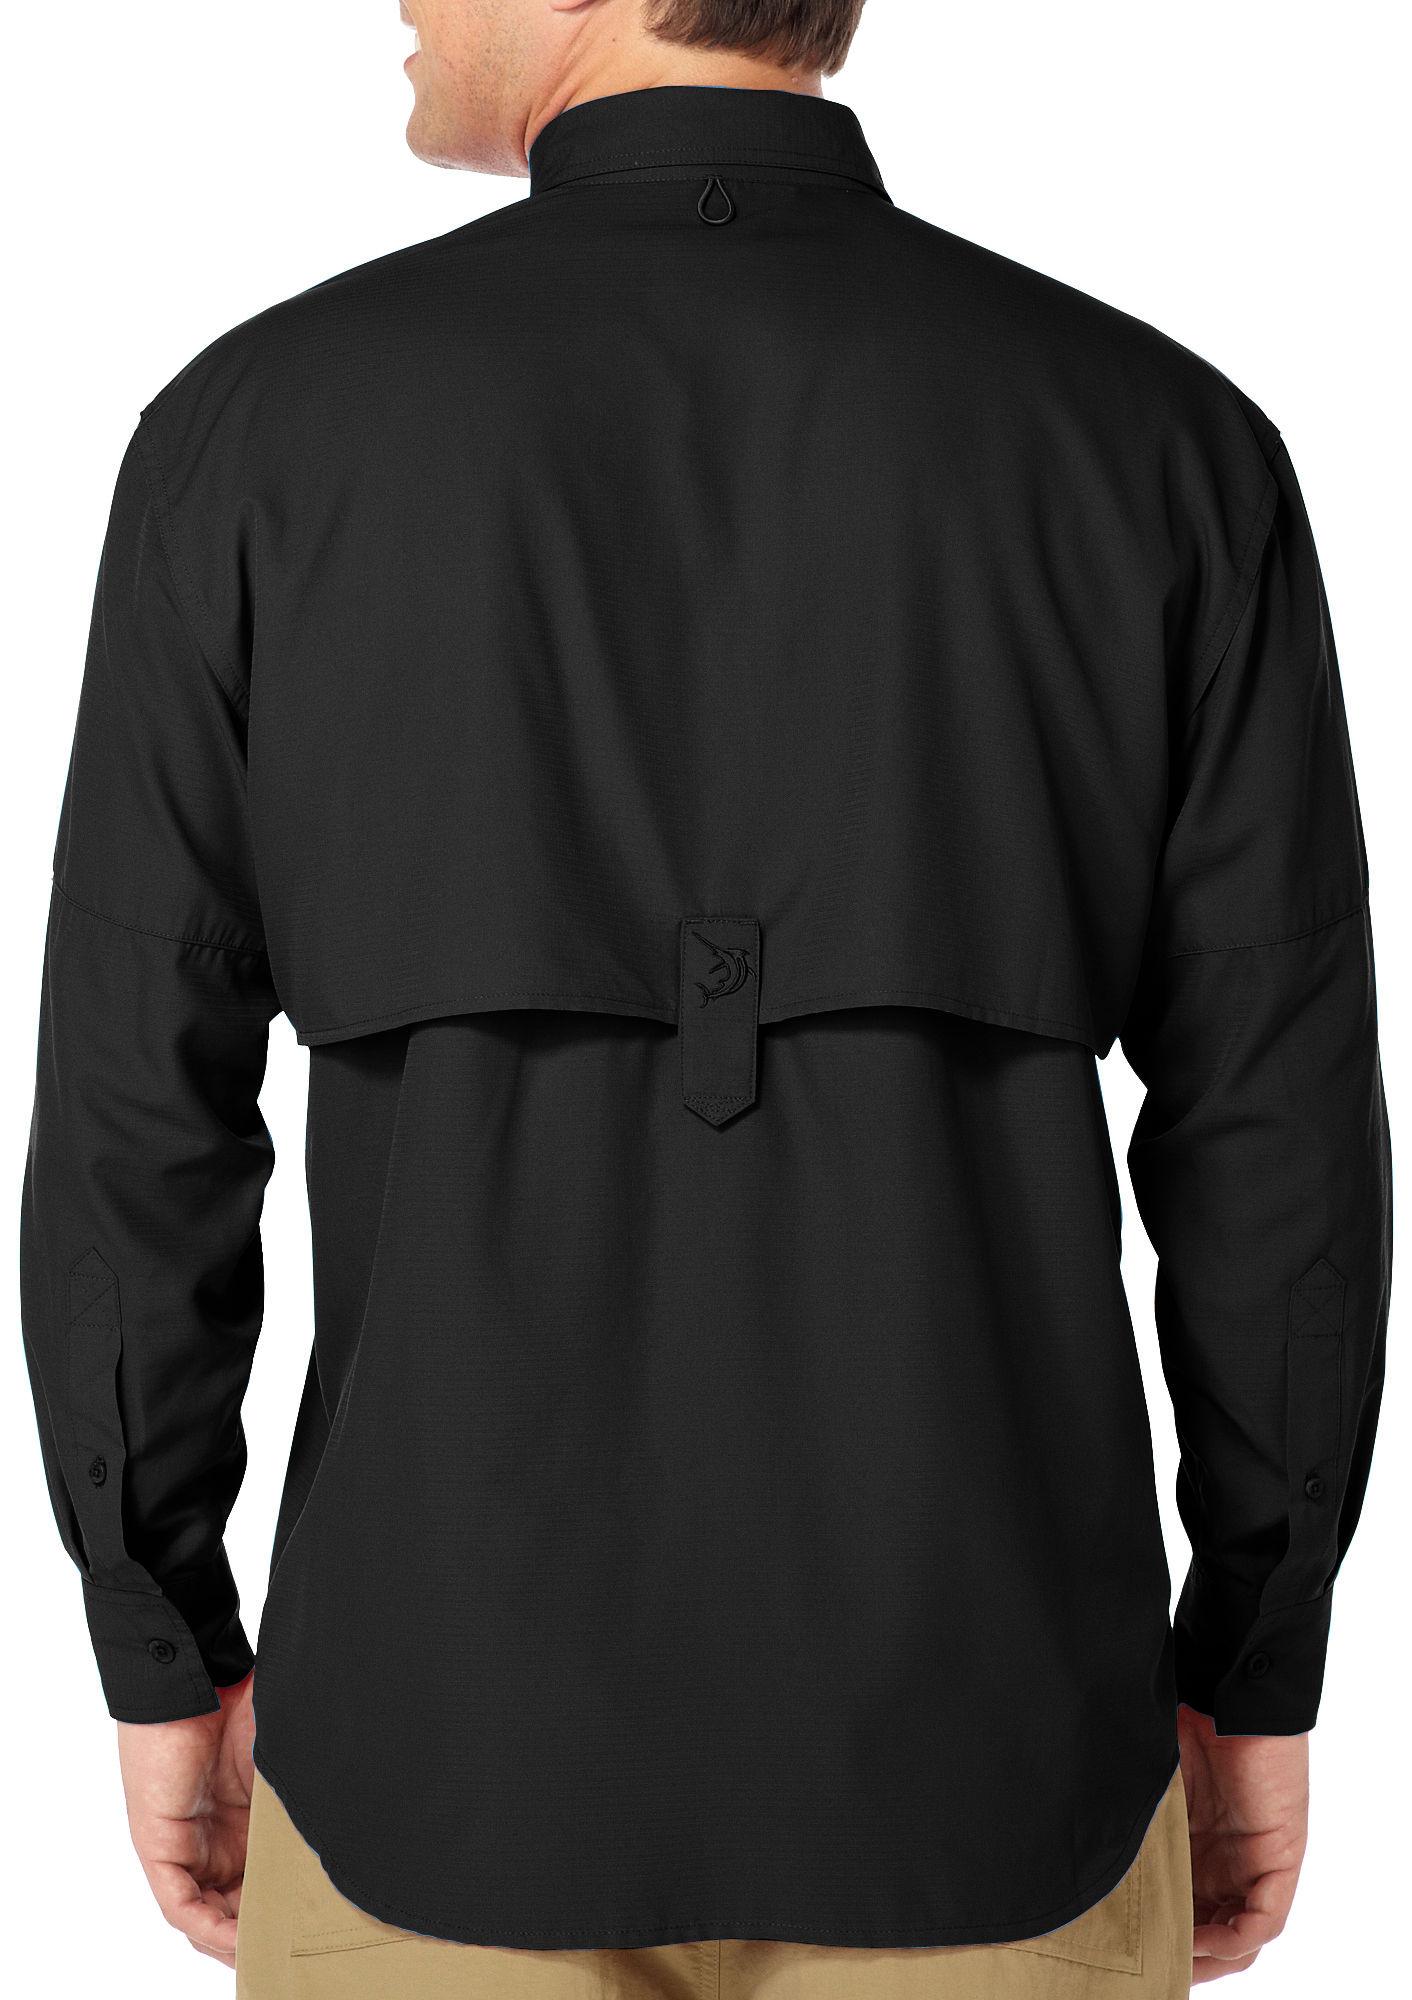 Reel legends mens long sleeve saltwater shirt ebay for Men s fishing apparel